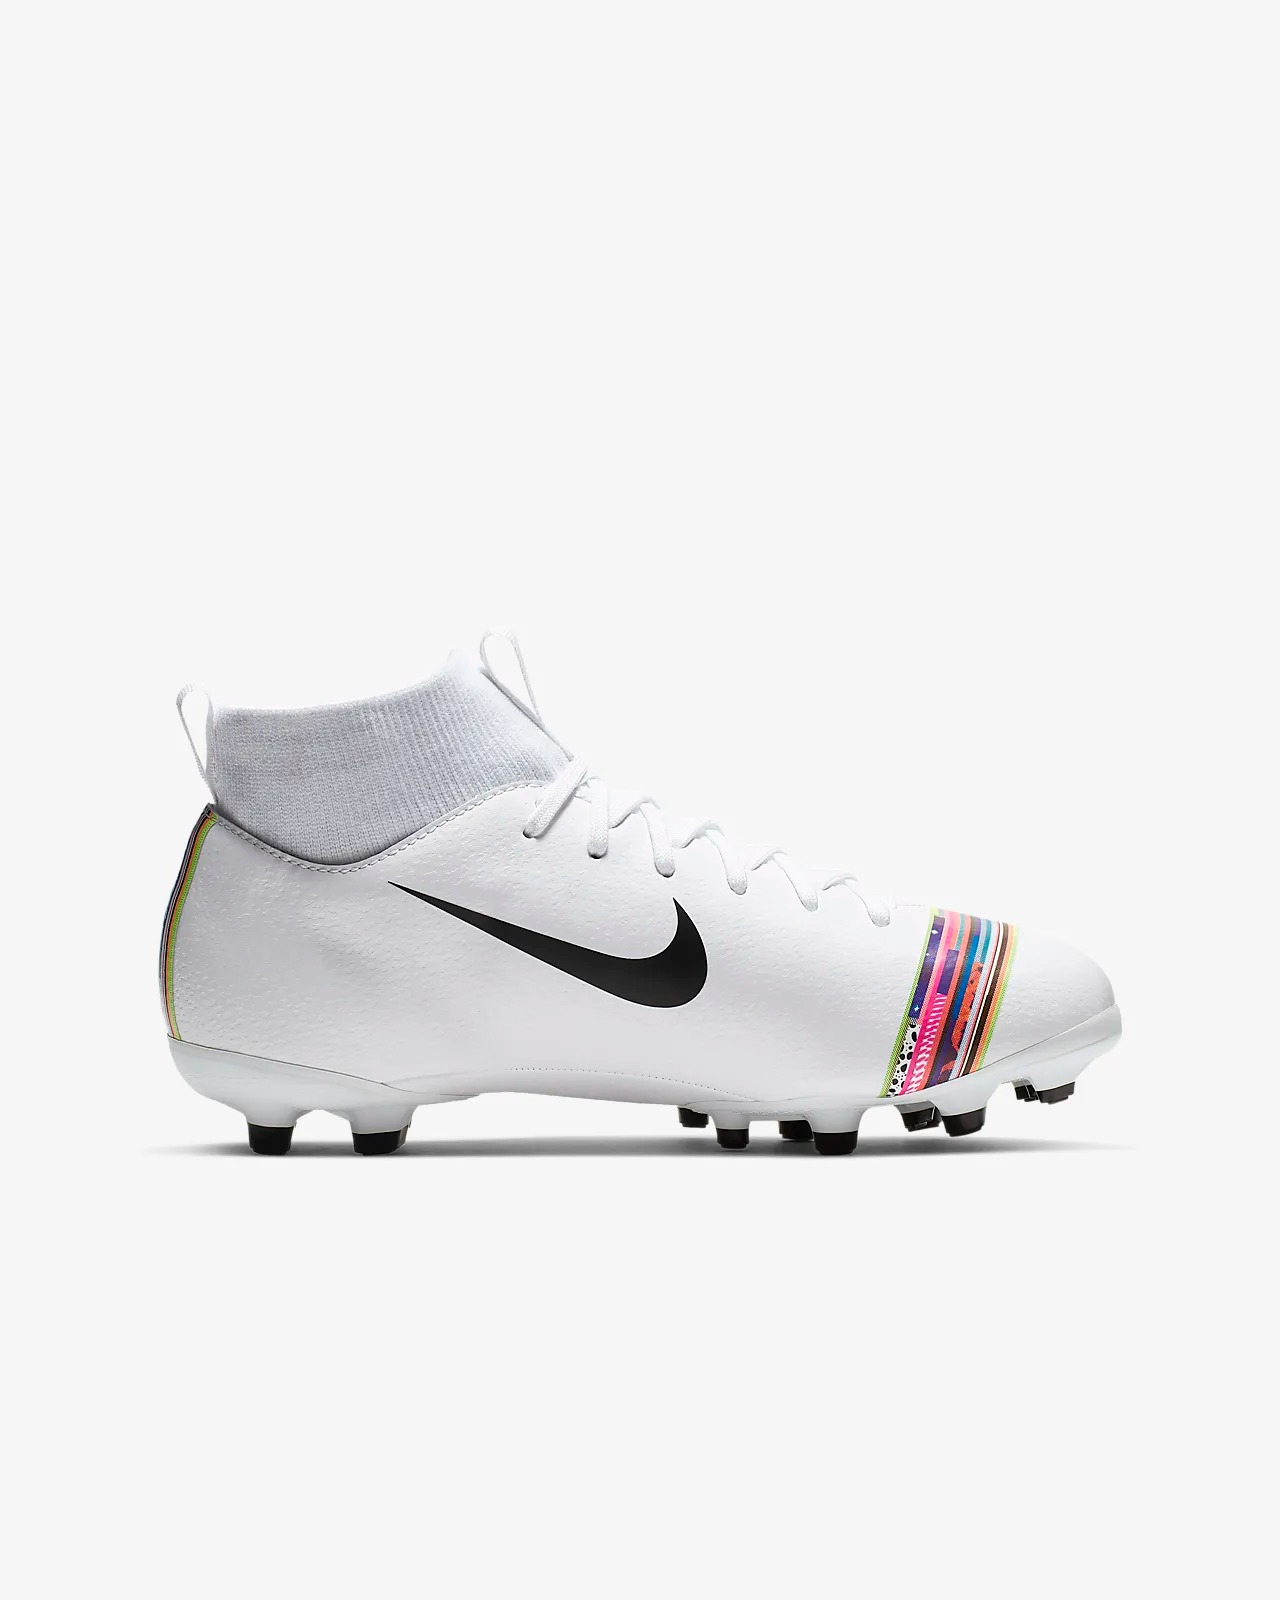 f28010c05 Nike Jr. Superfly 6 Academy GS FG MG - Soccer Cleats CR7 Ronaldo Football  Cleats - Superfanas.lt